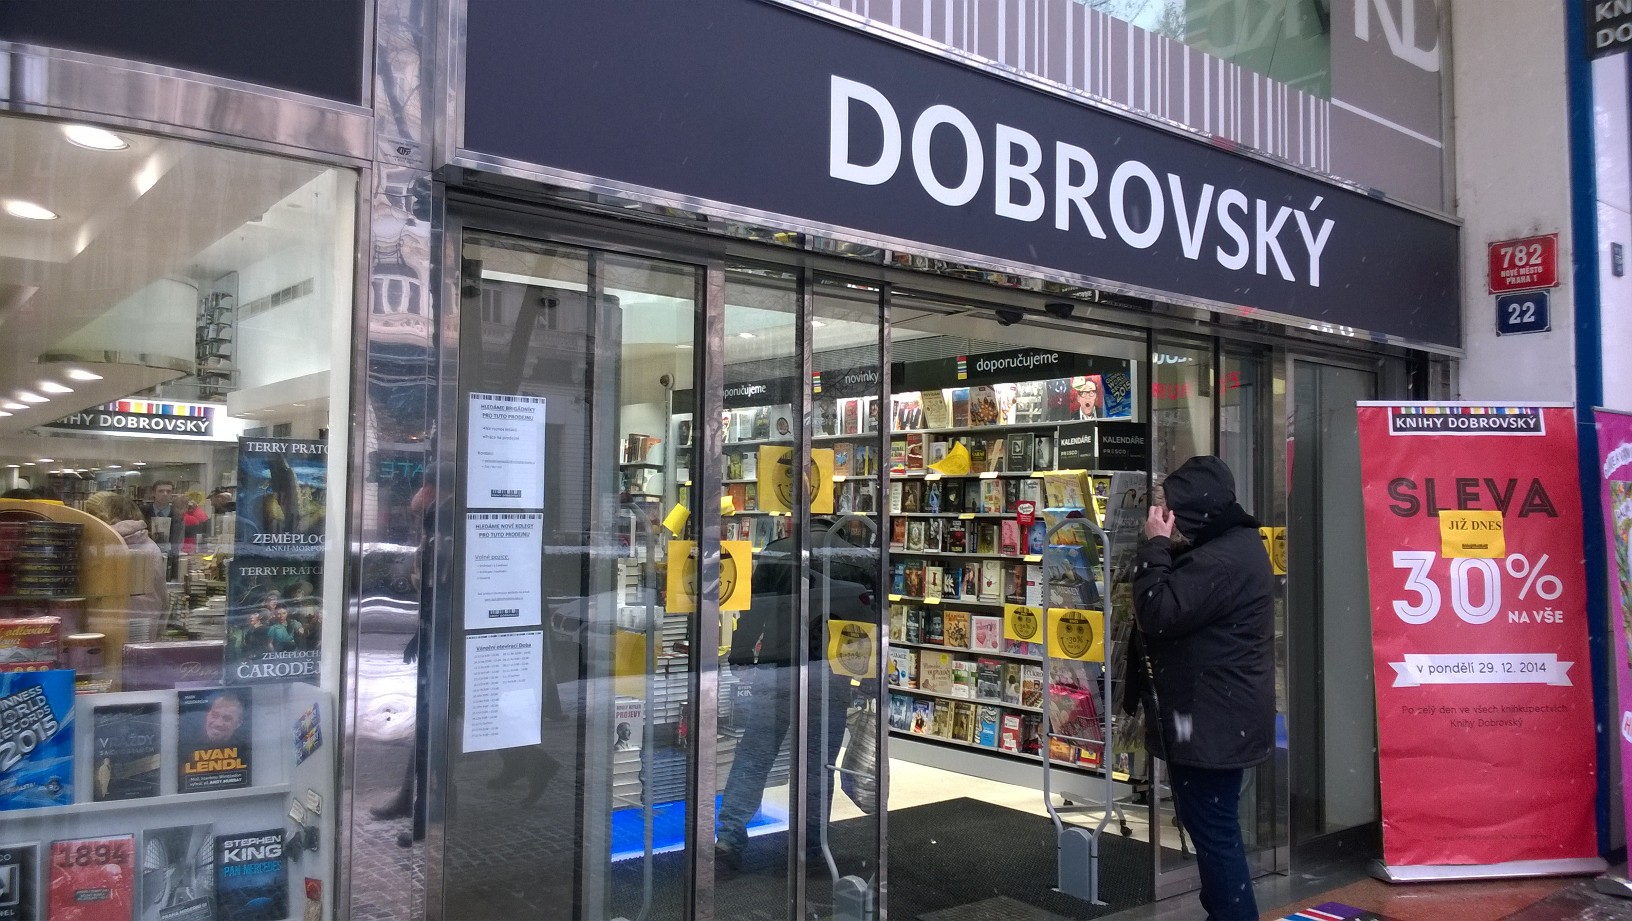 Księgarnia sieciowa